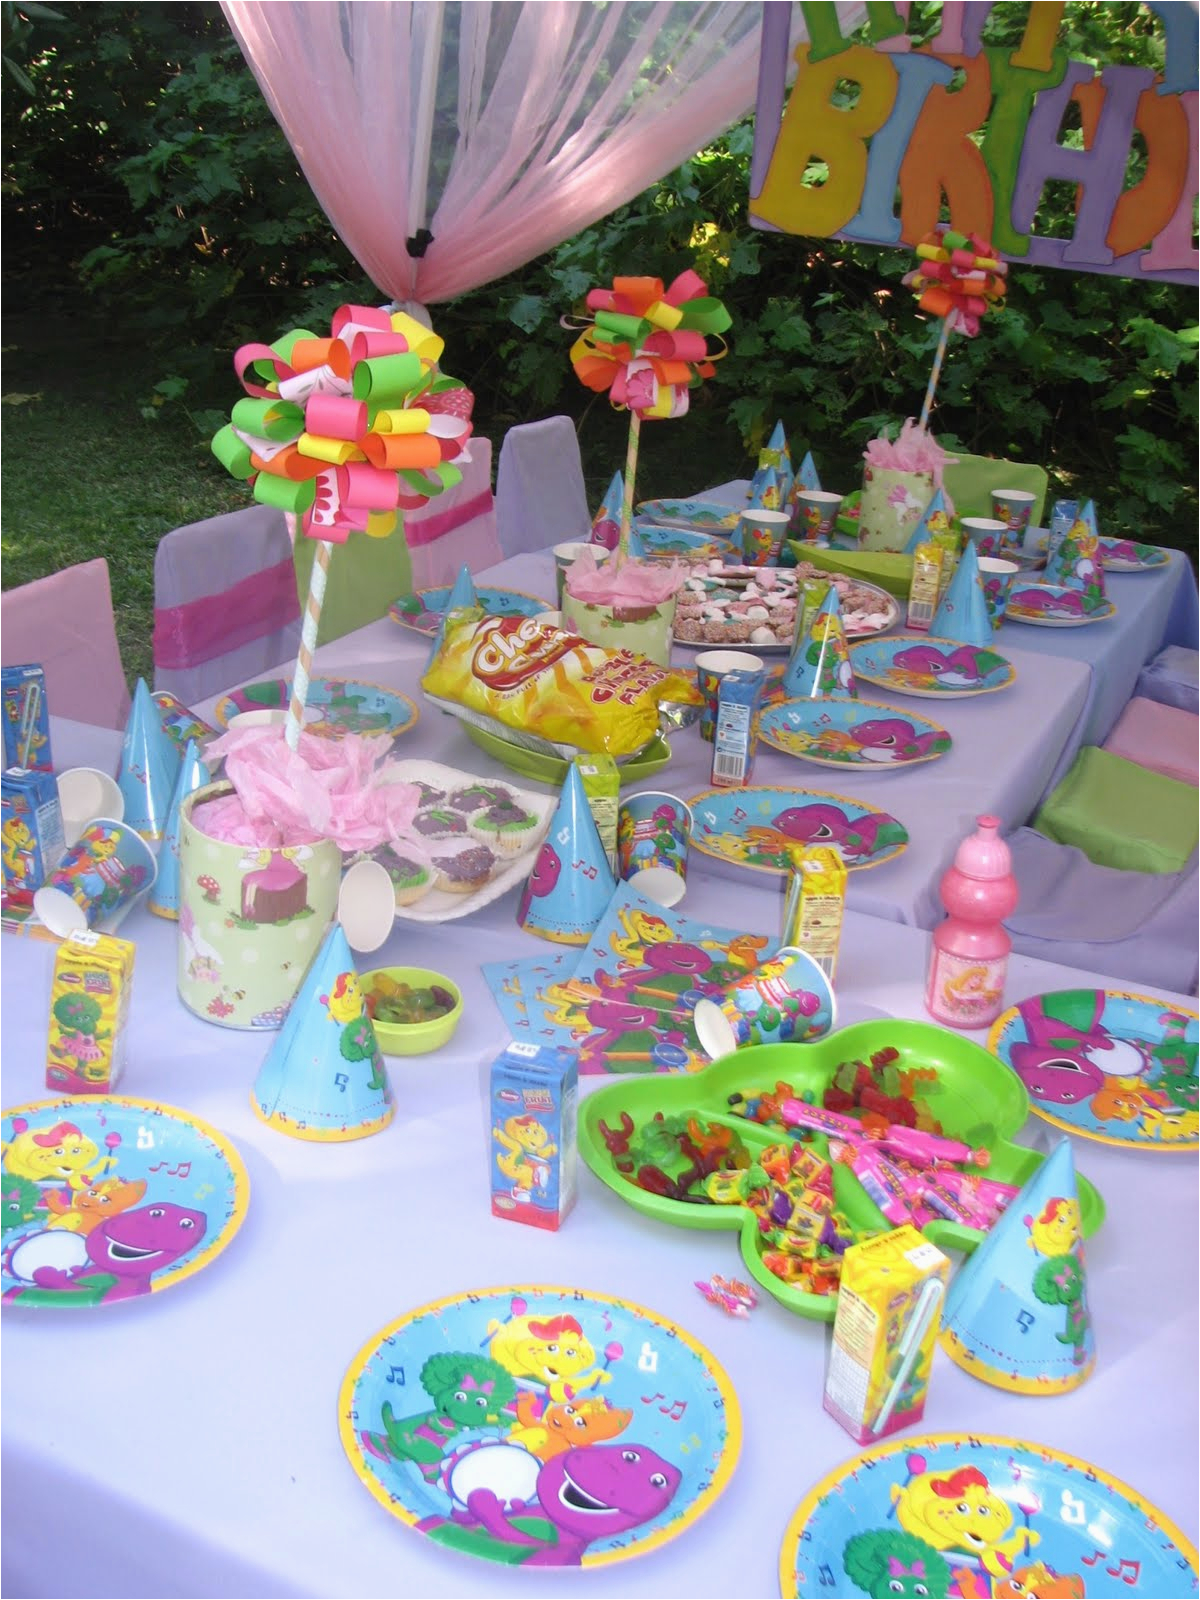 barney party for ella rose xxx